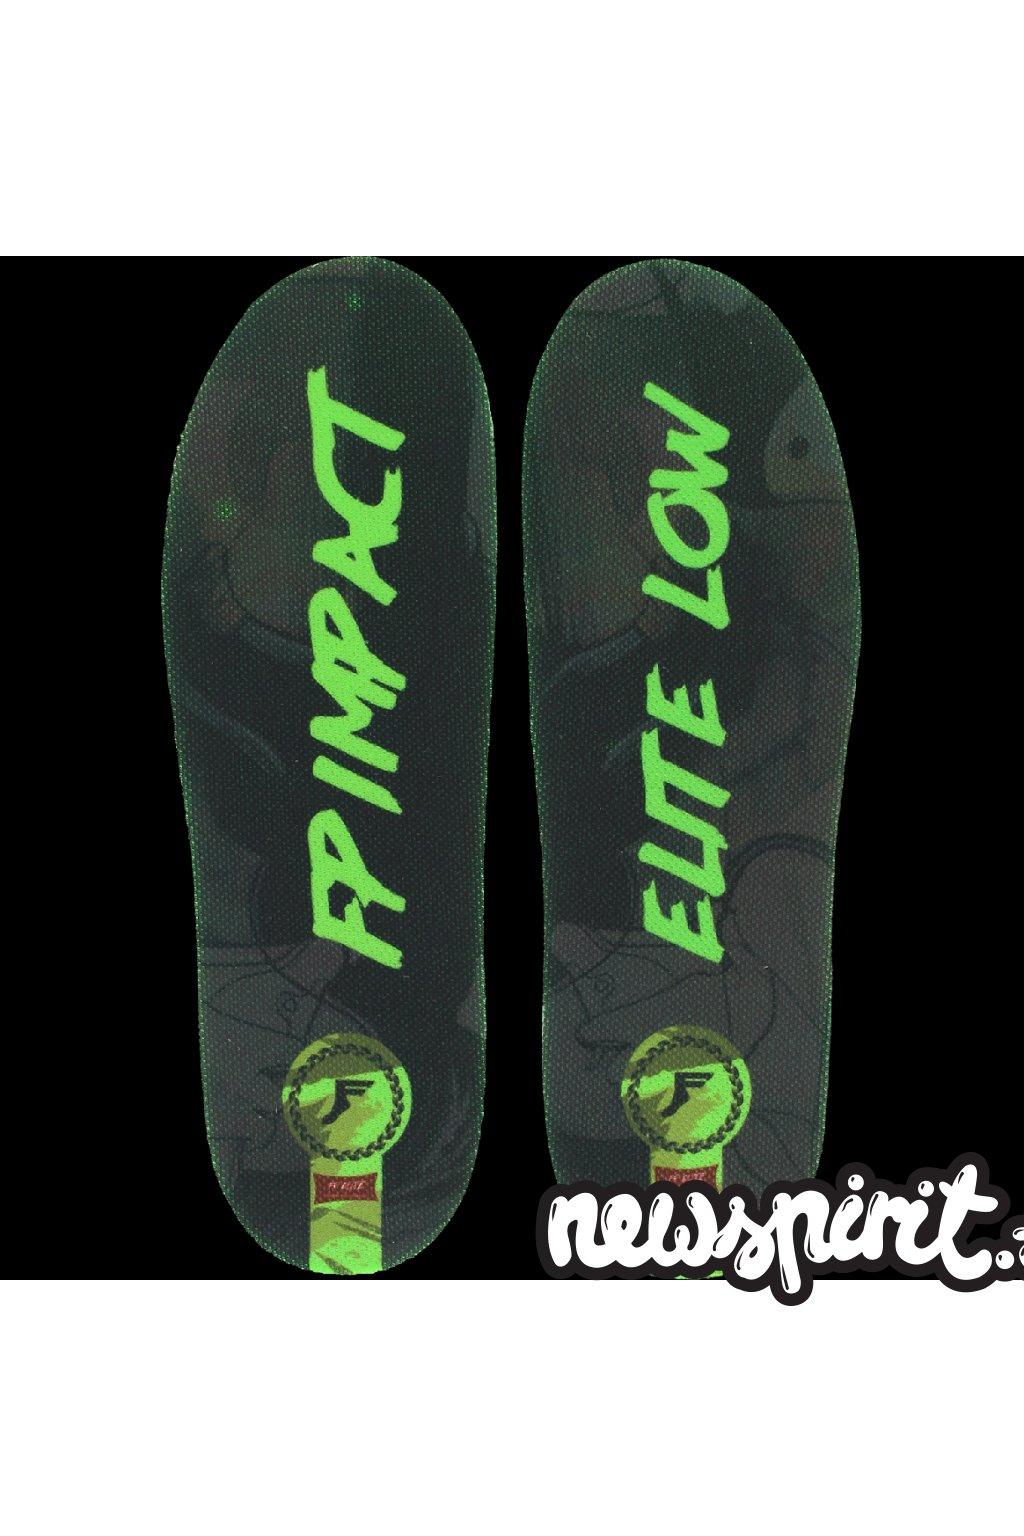 footprint elite low classic Kingfoam green